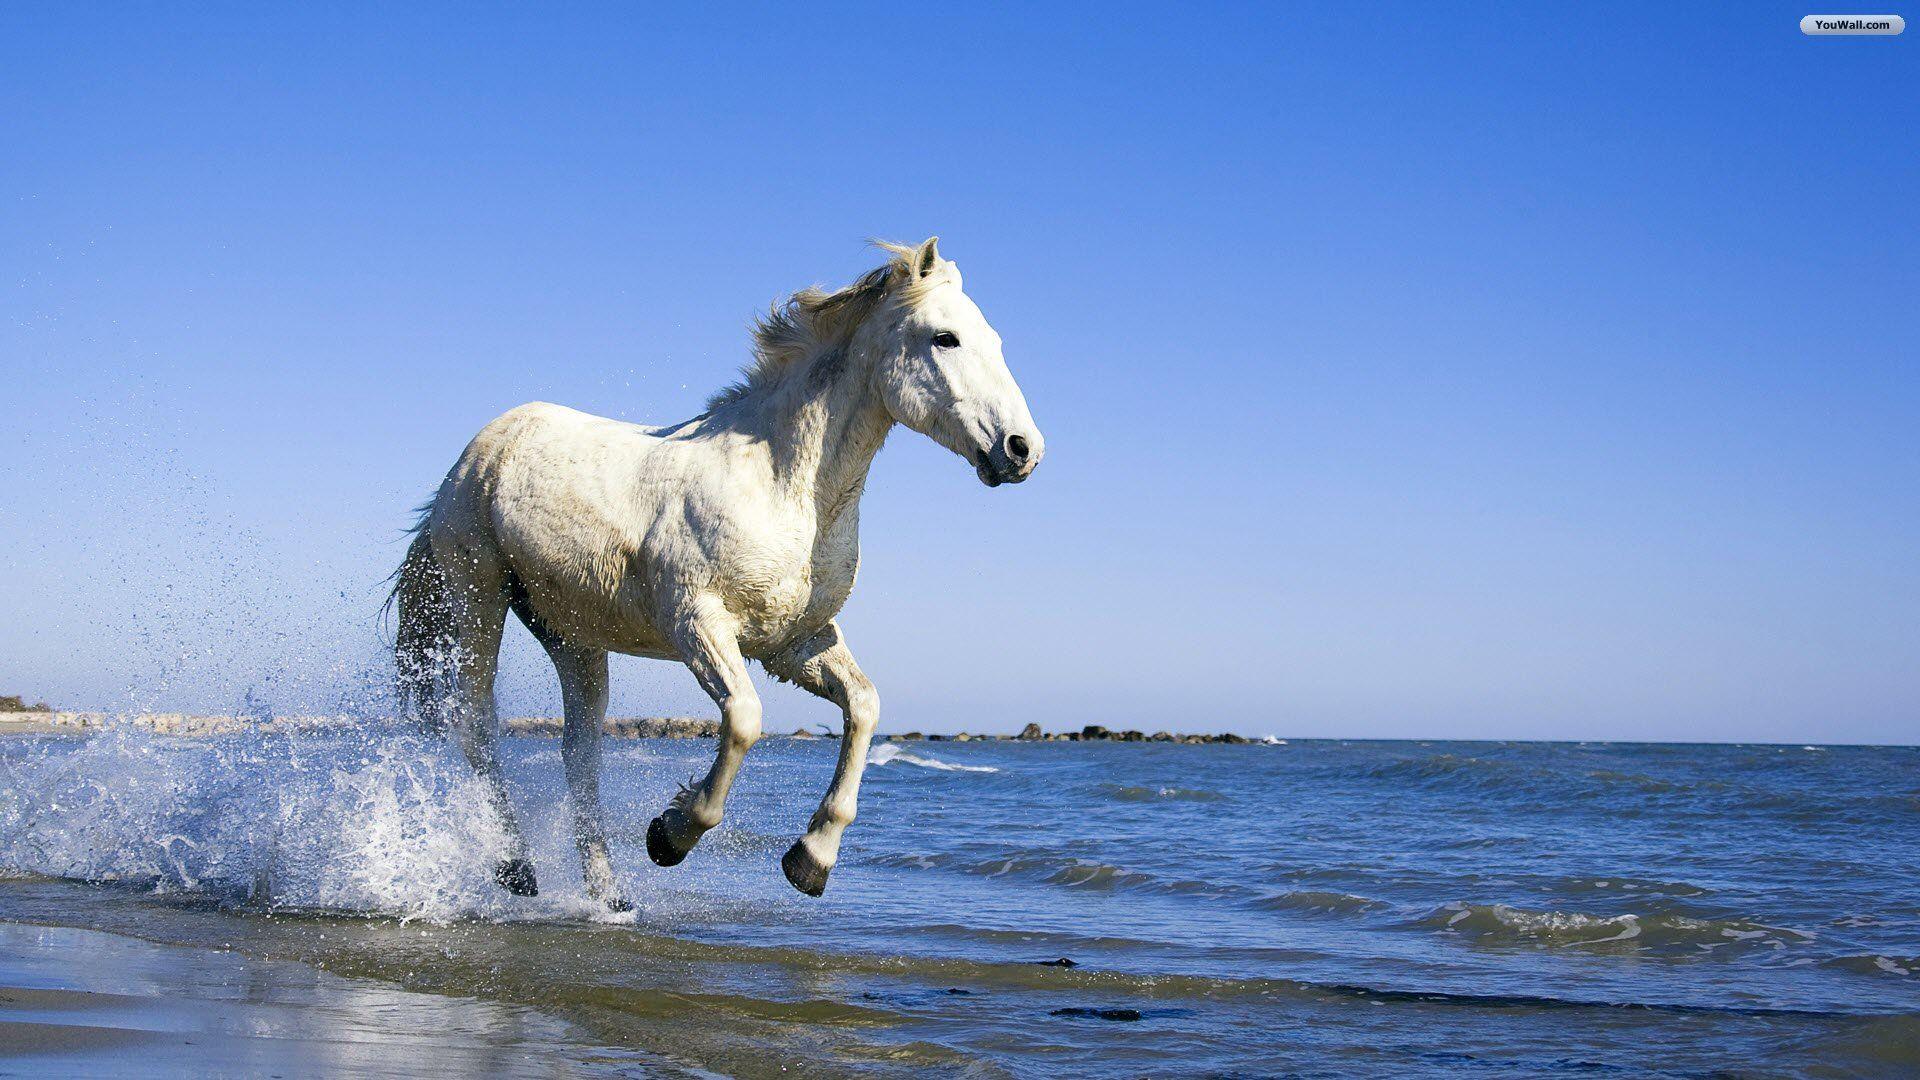 Beautiful Wallpaper Horse Desktop Background - 301a0a29f59cfc2c3e0dece7286397a0  You Should Have_485685.jpg